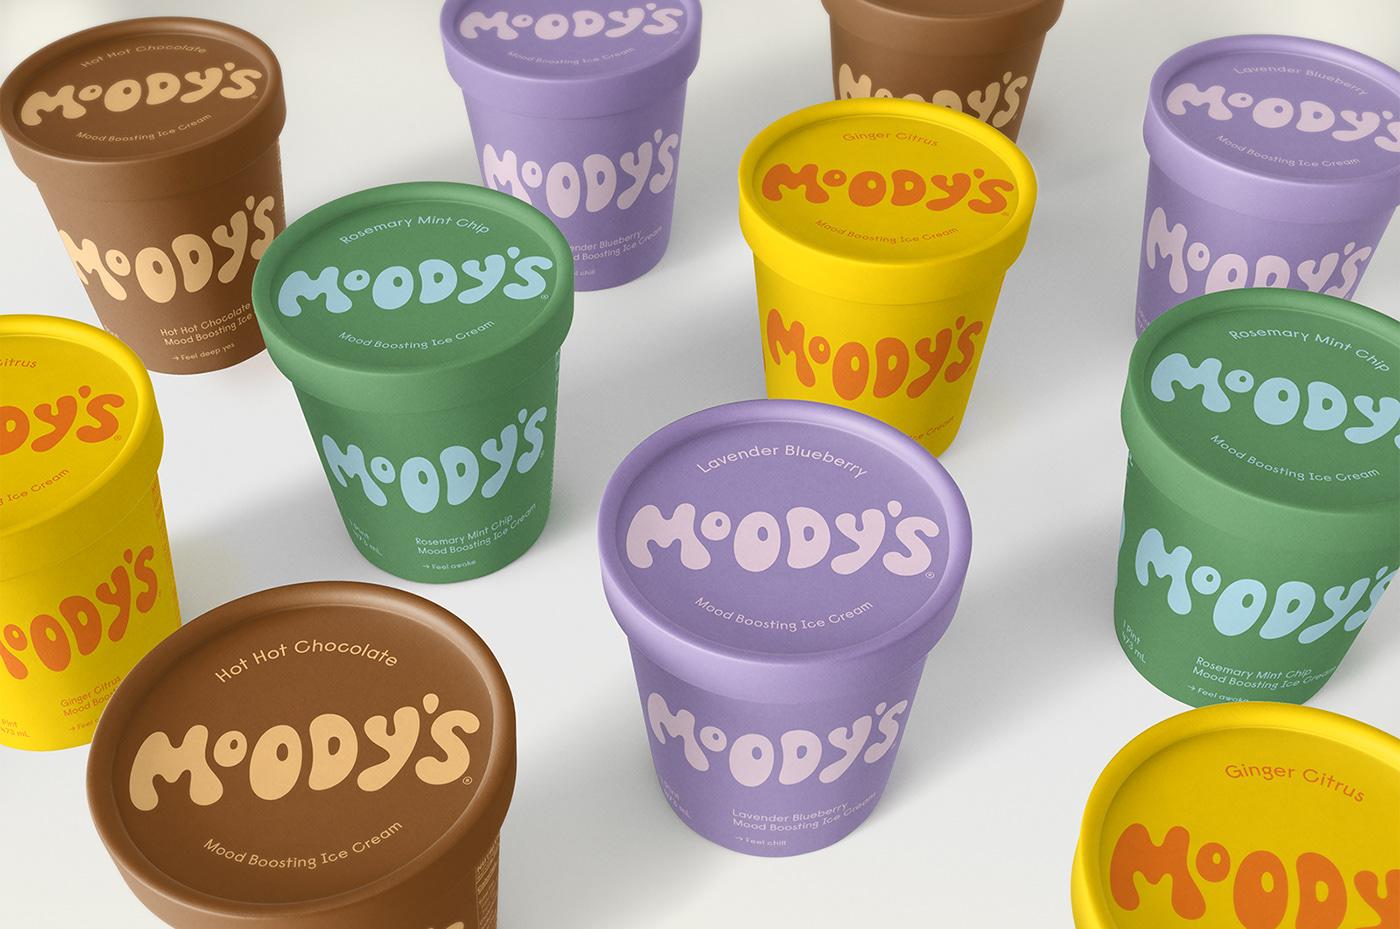 Moody's ice cream branding and packaging design by Abby Haddican Studio.